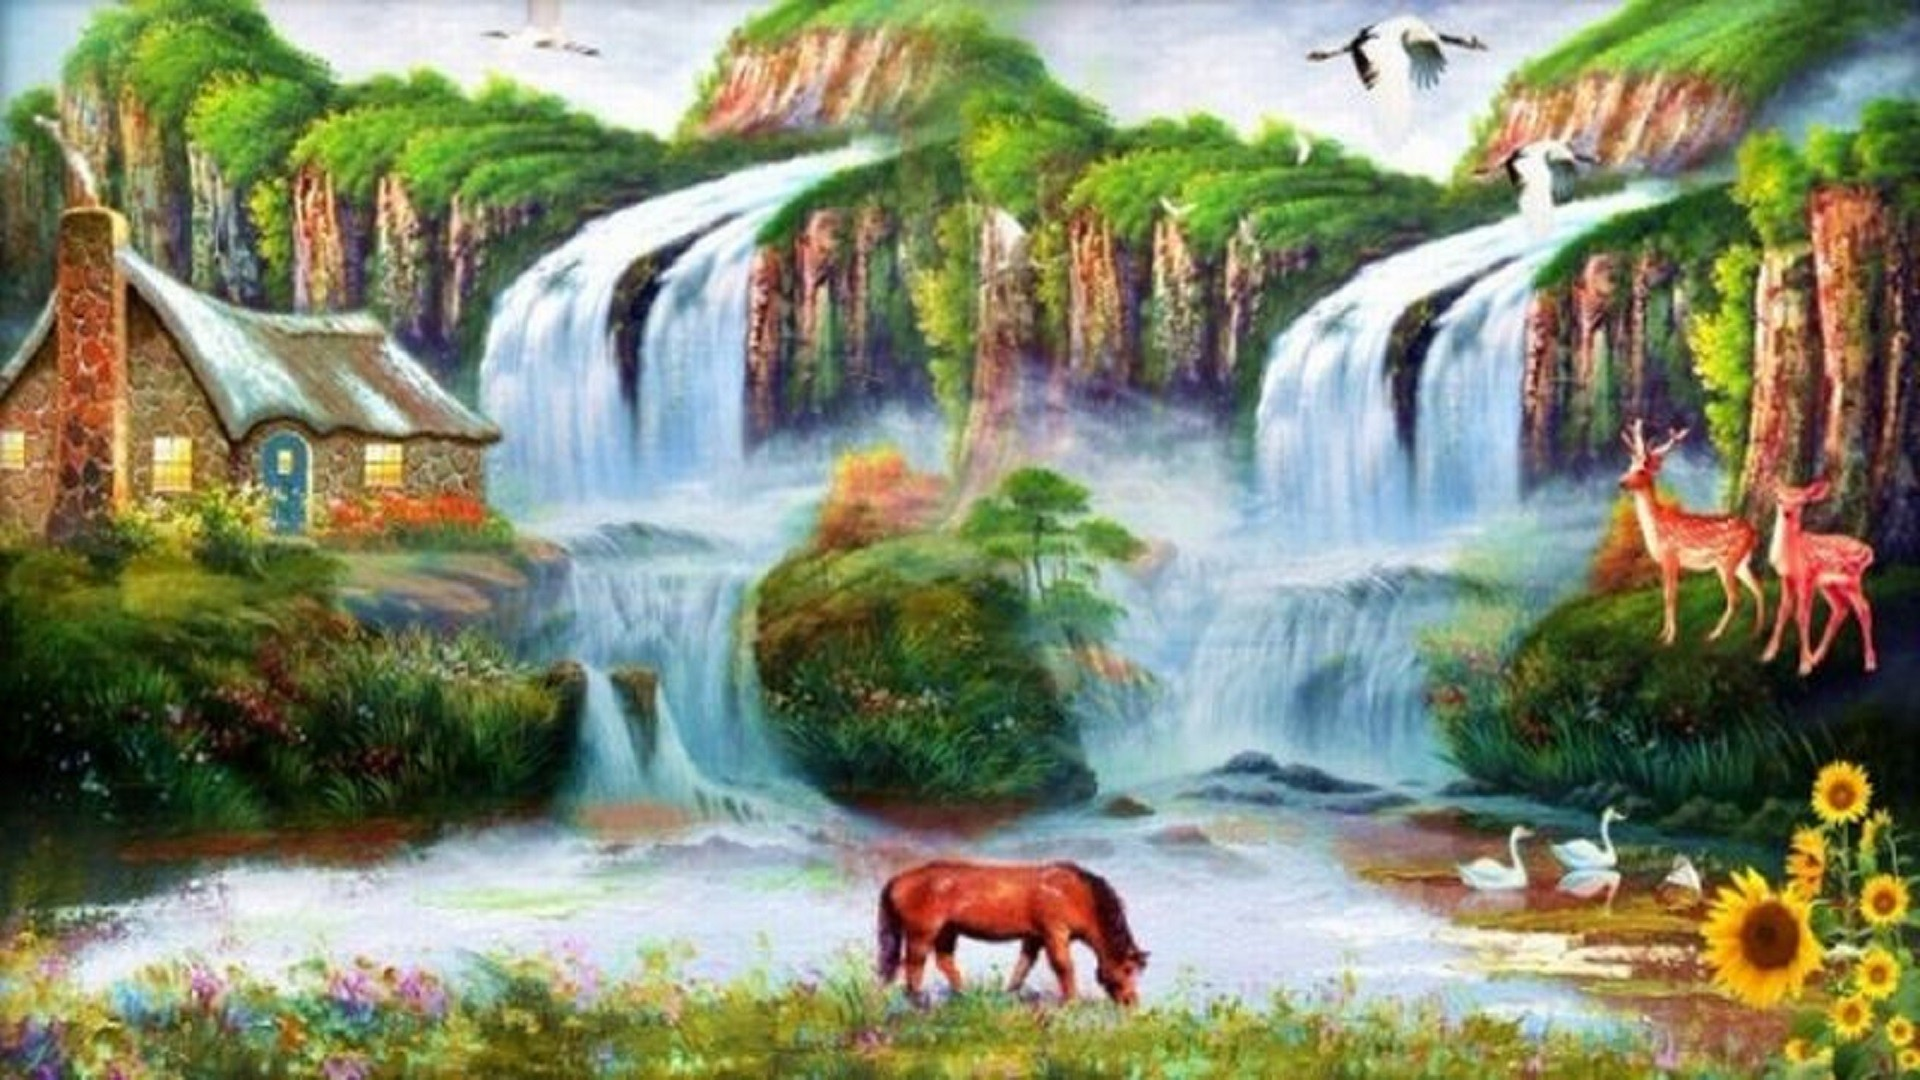 Computer Wallpaper Nature Scenes (54+ Images